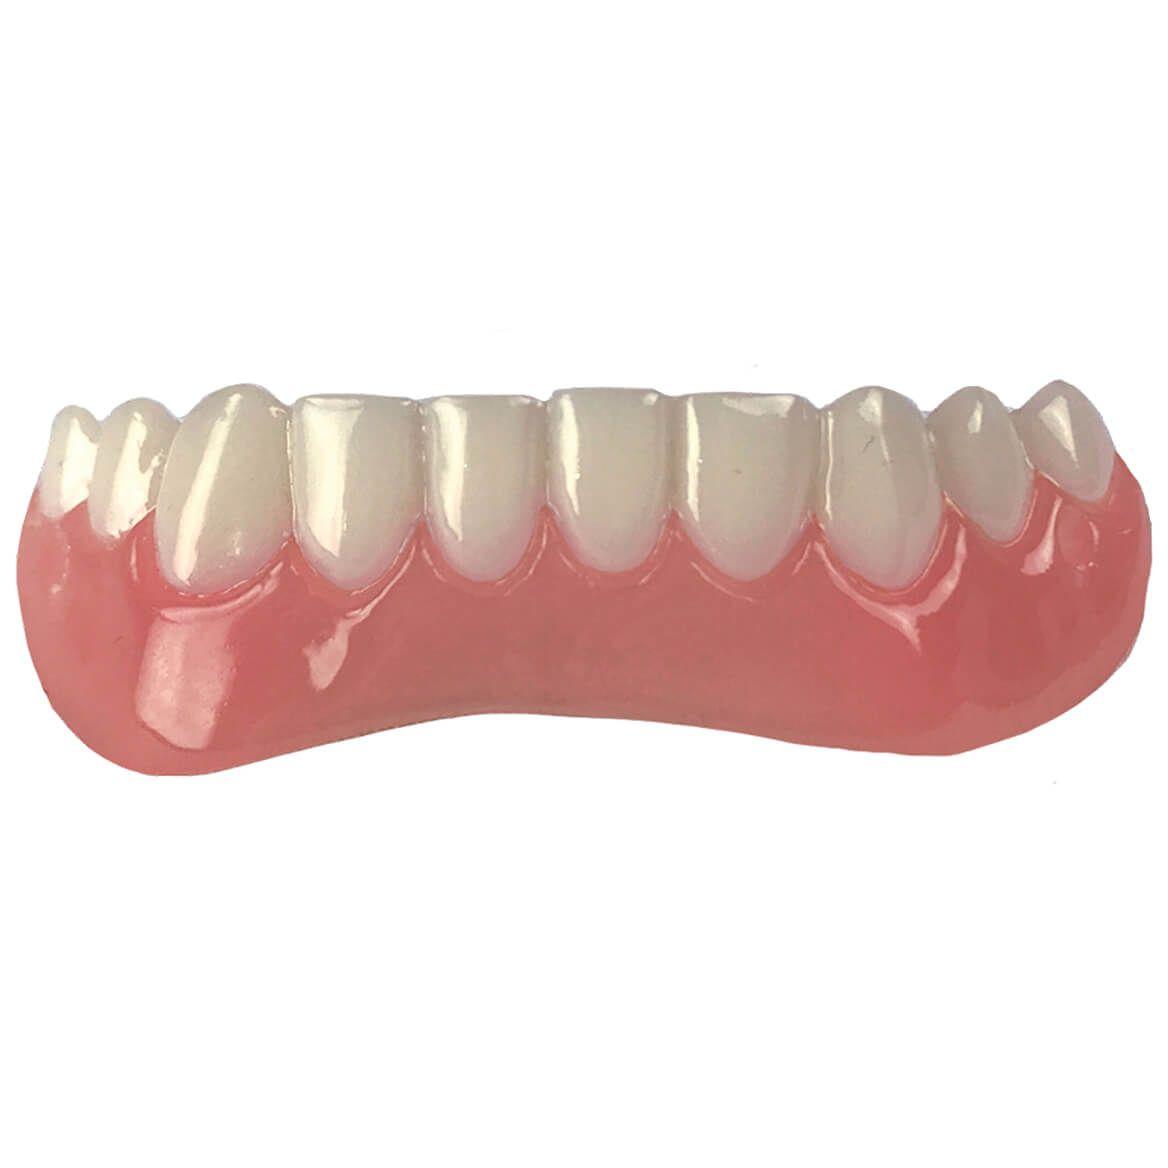 Instant Smile™ Hand Made Lower Veneer Bright White-371253